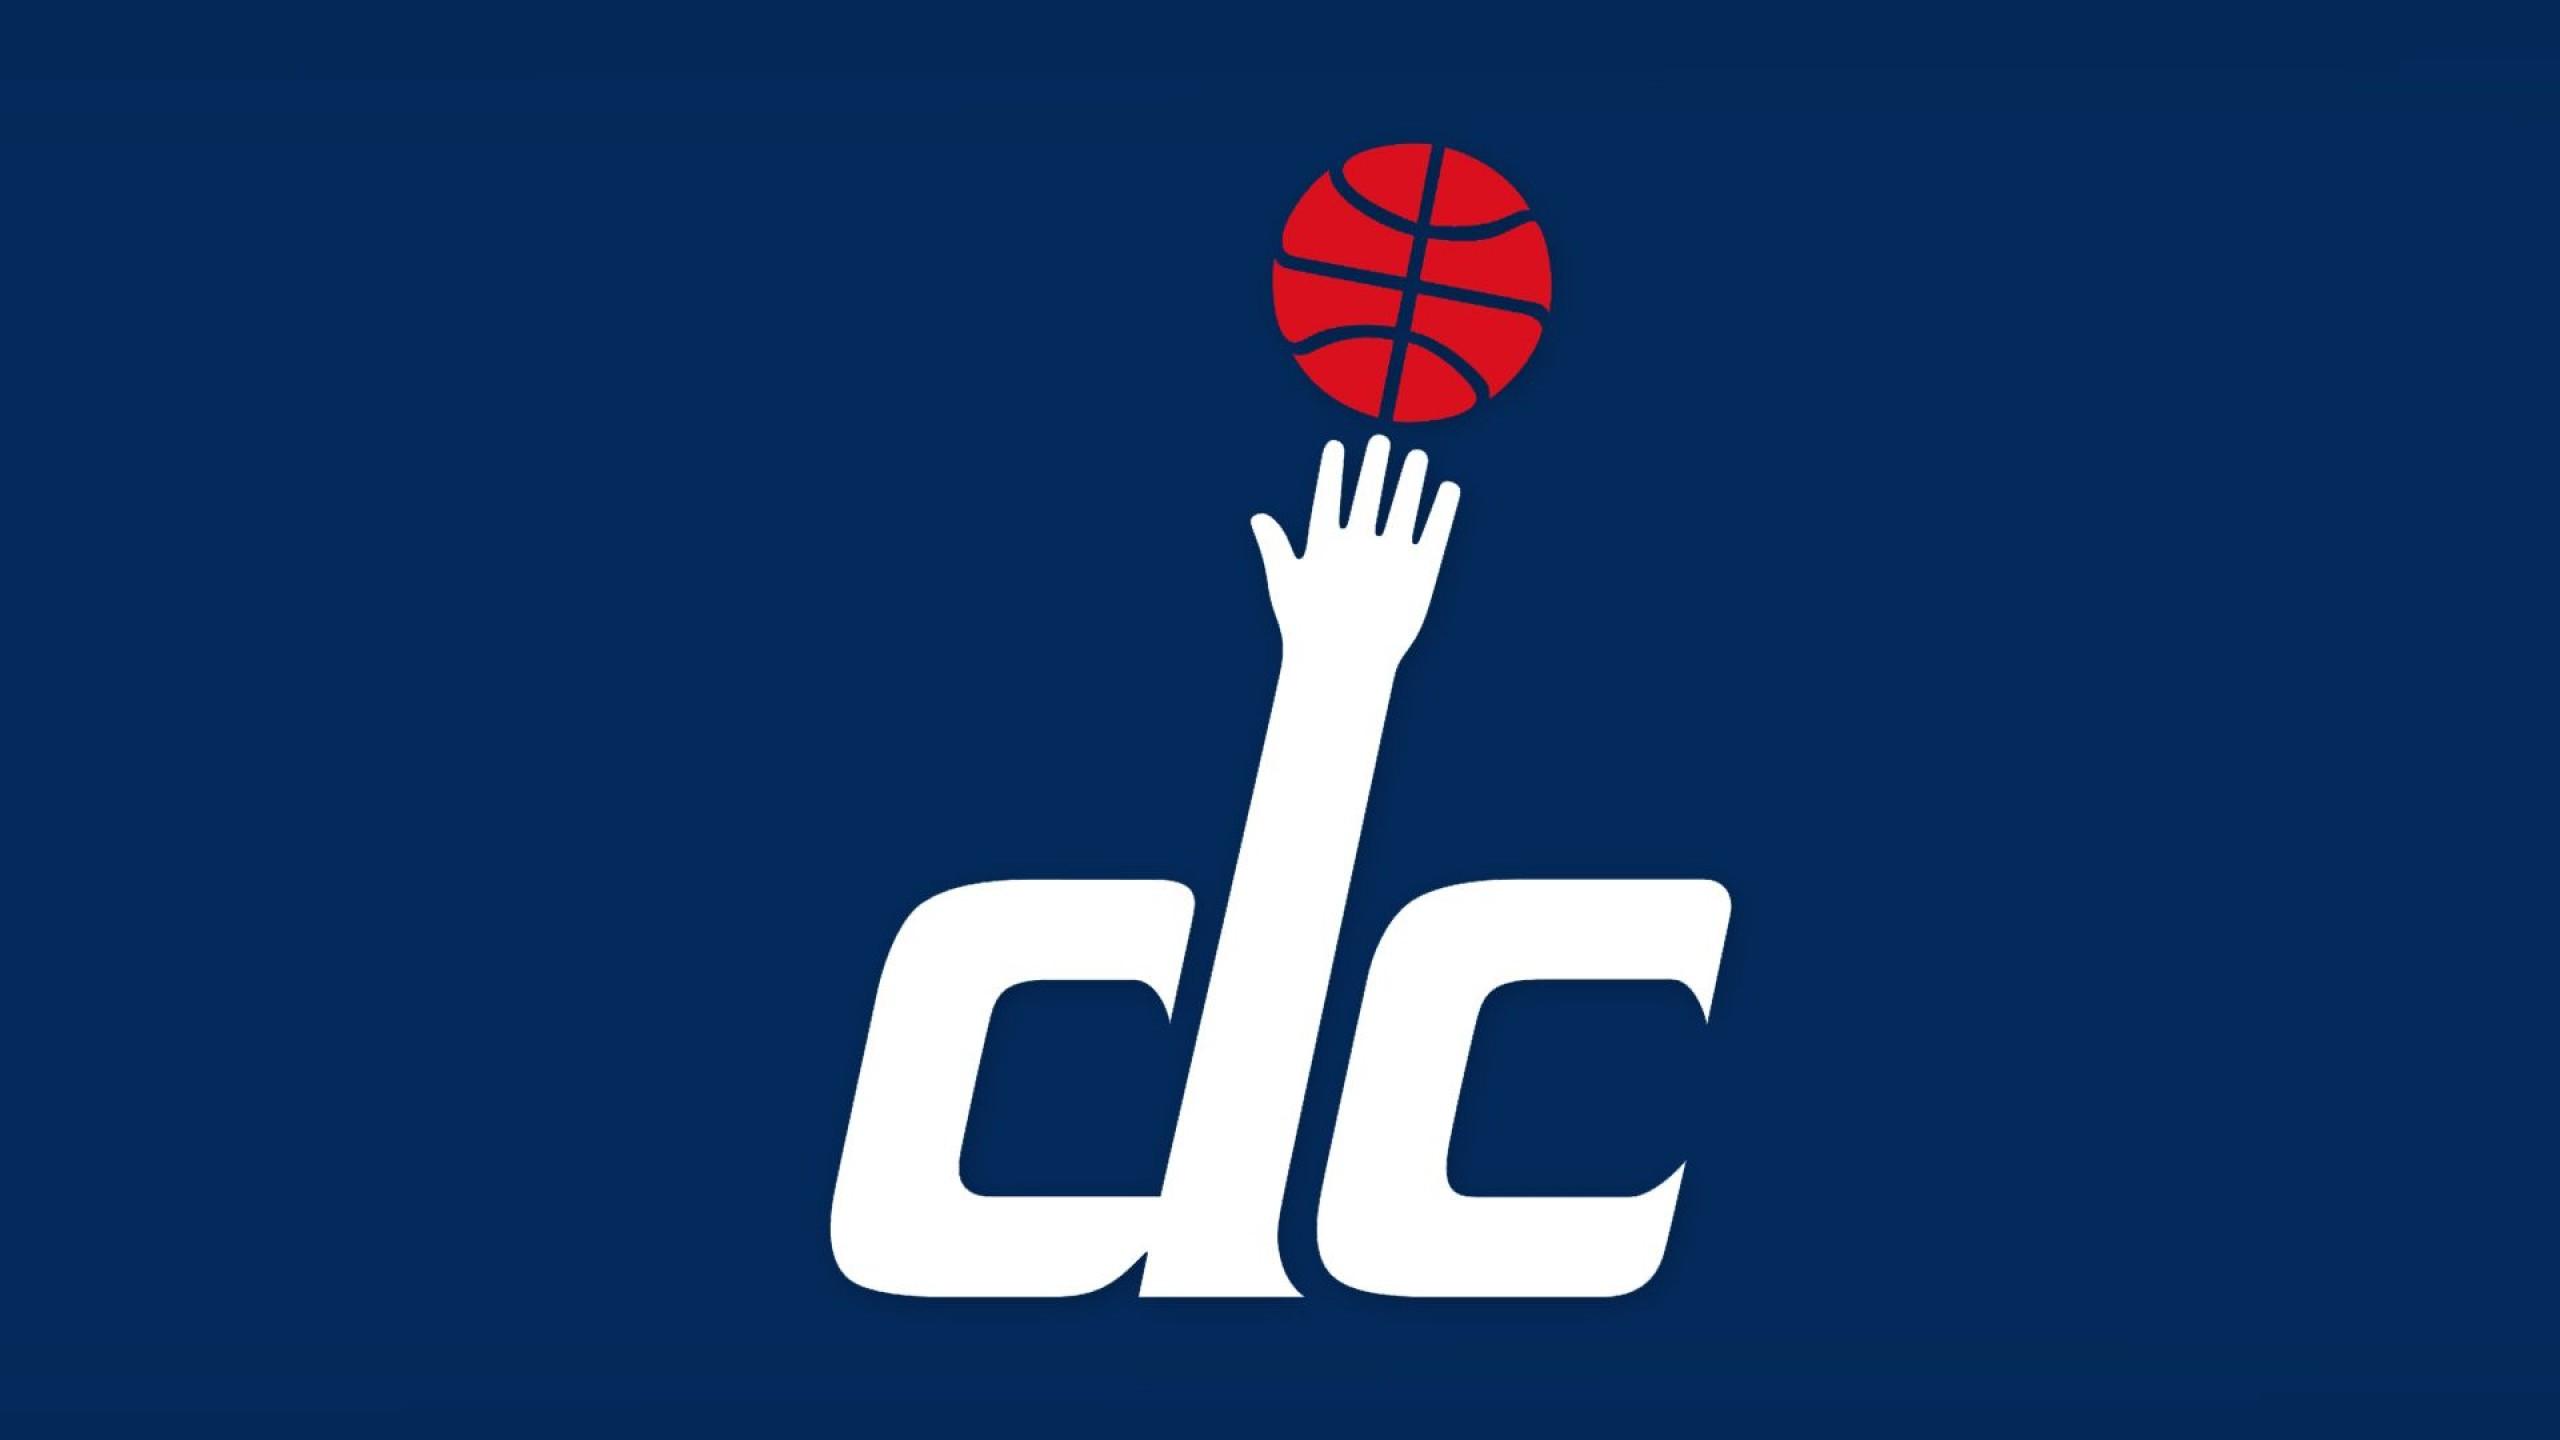 WASHINGTON WIZARDS nba basketball 12 wallpaper 2560x1440 226663 2560x1440